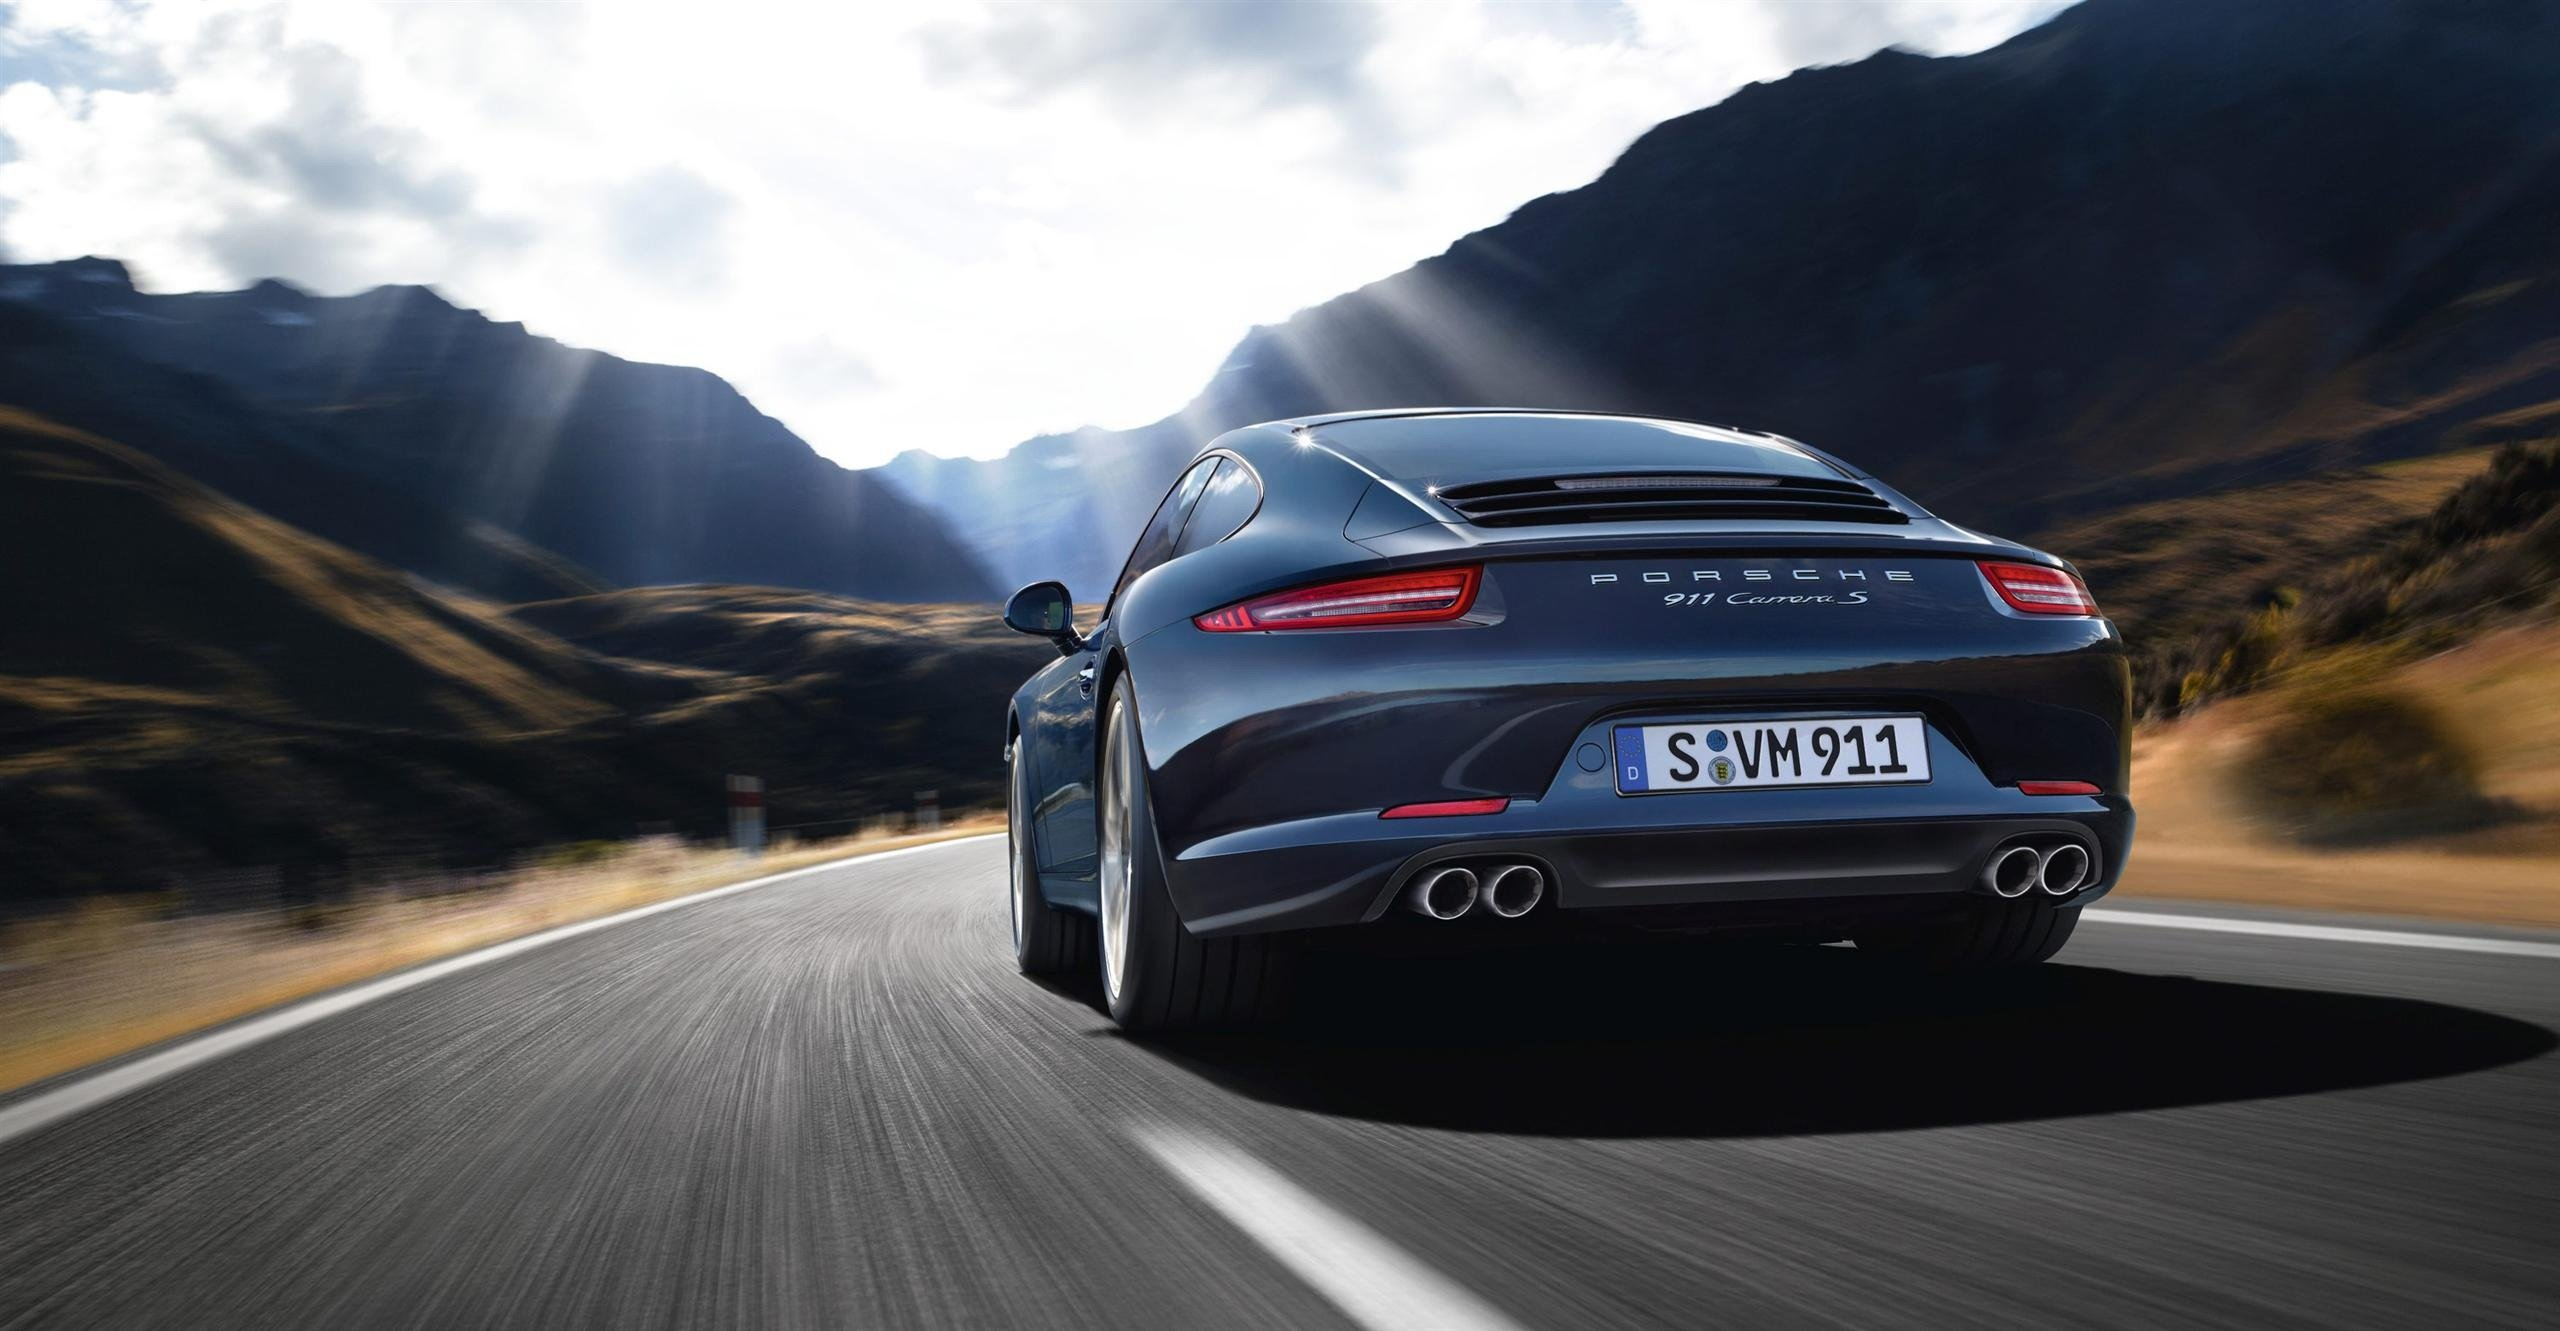 48 Porsche Hd Wallpapers 1080p On Wallpapersafari